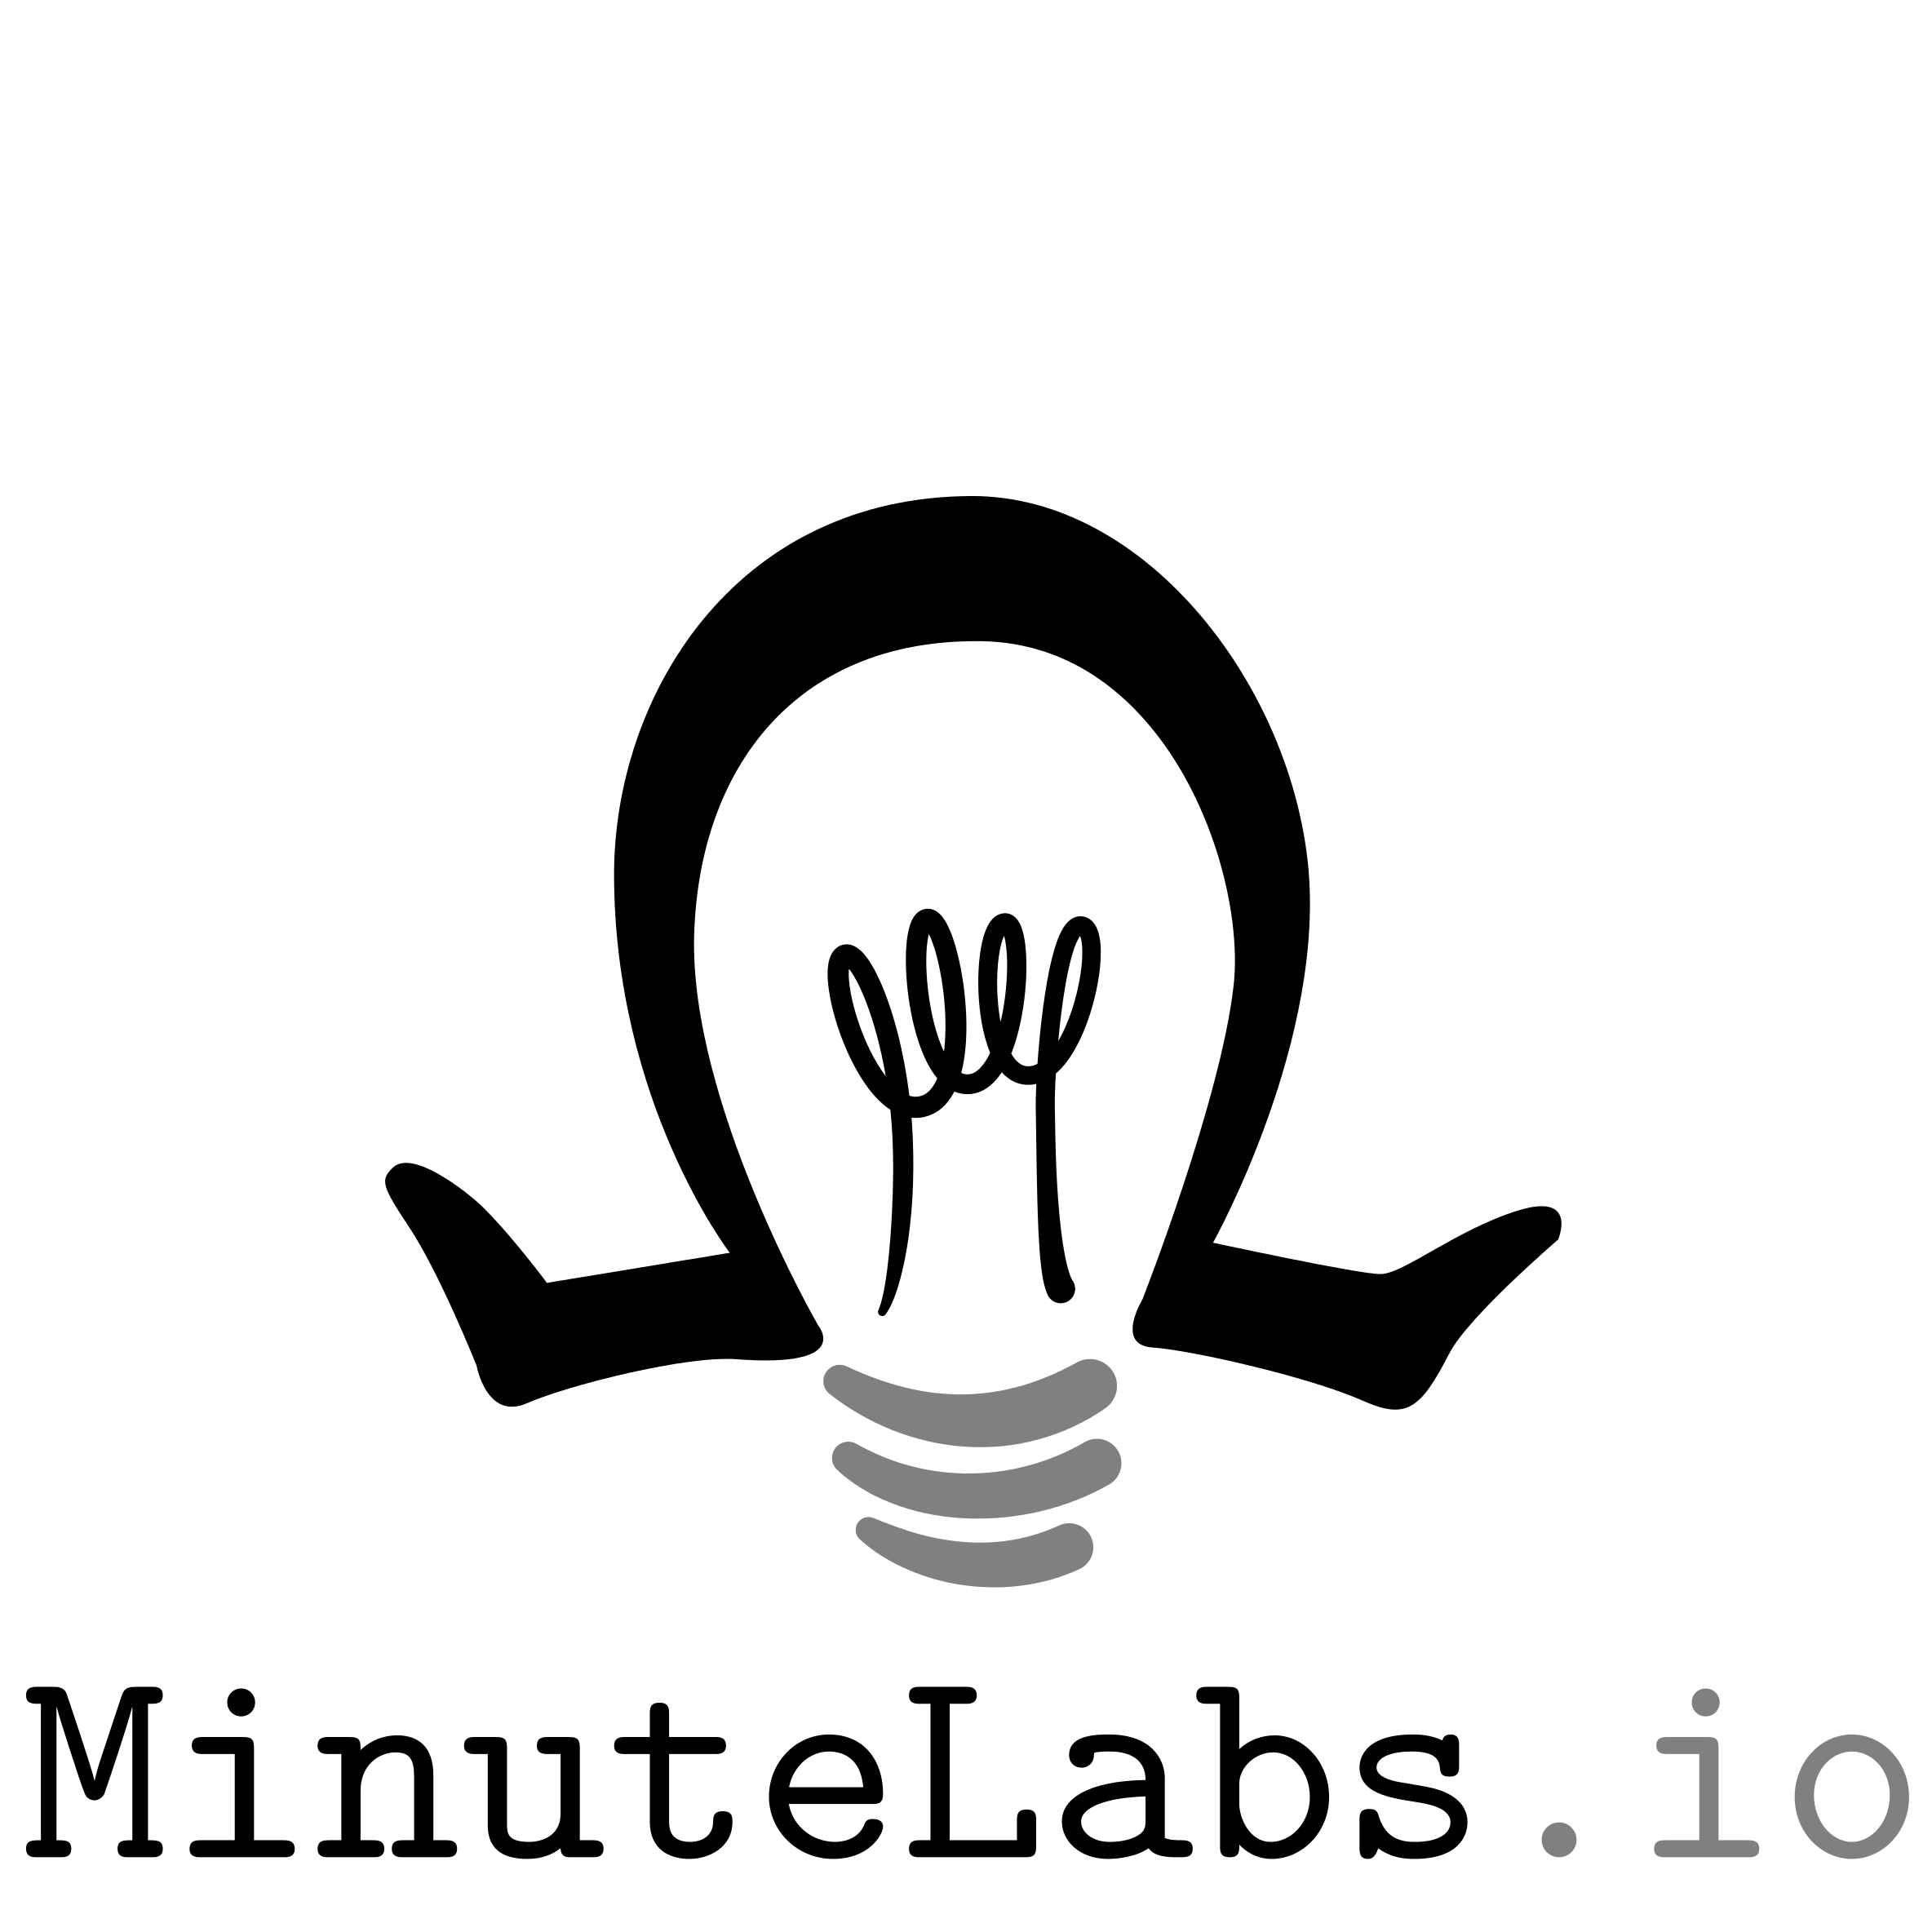 MinuteLabs.io